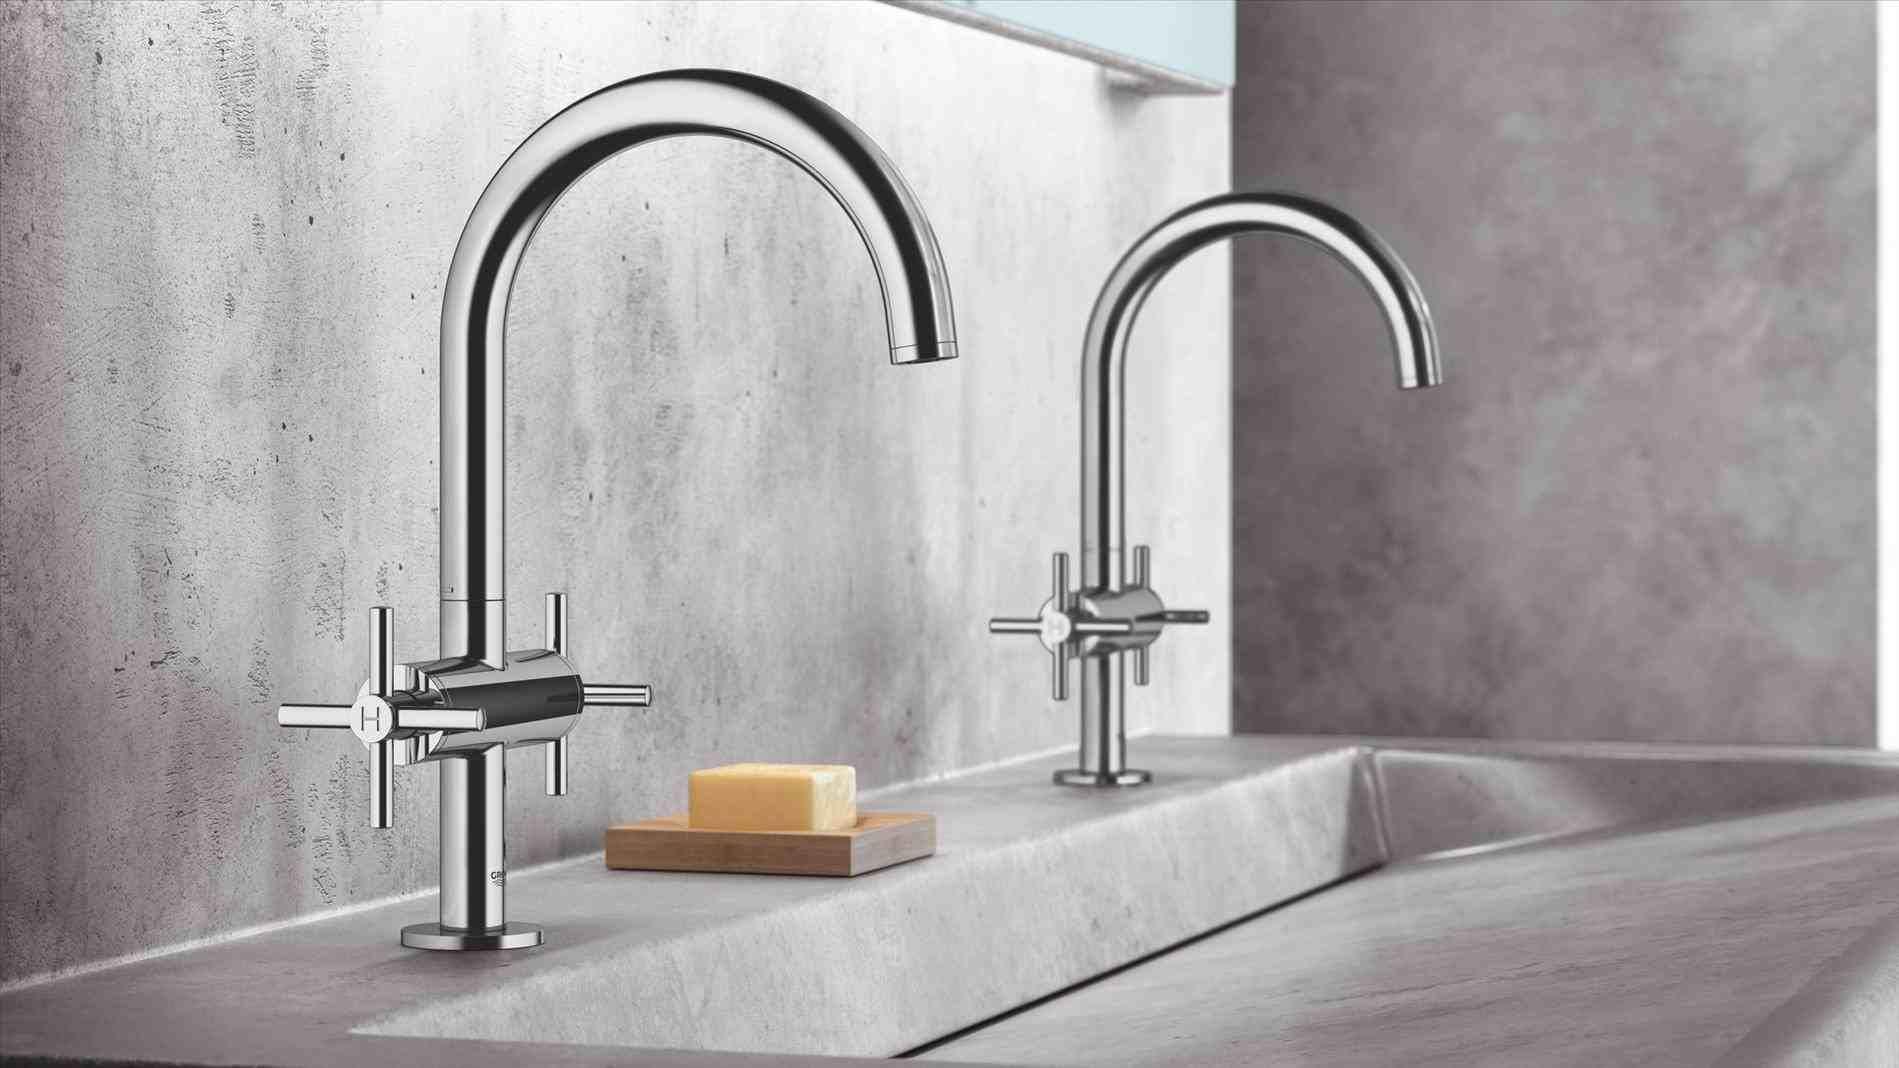 Badezimmer ideen dunkle holzböden new post grohe bathroom faucets visit bathroomremodelideassub